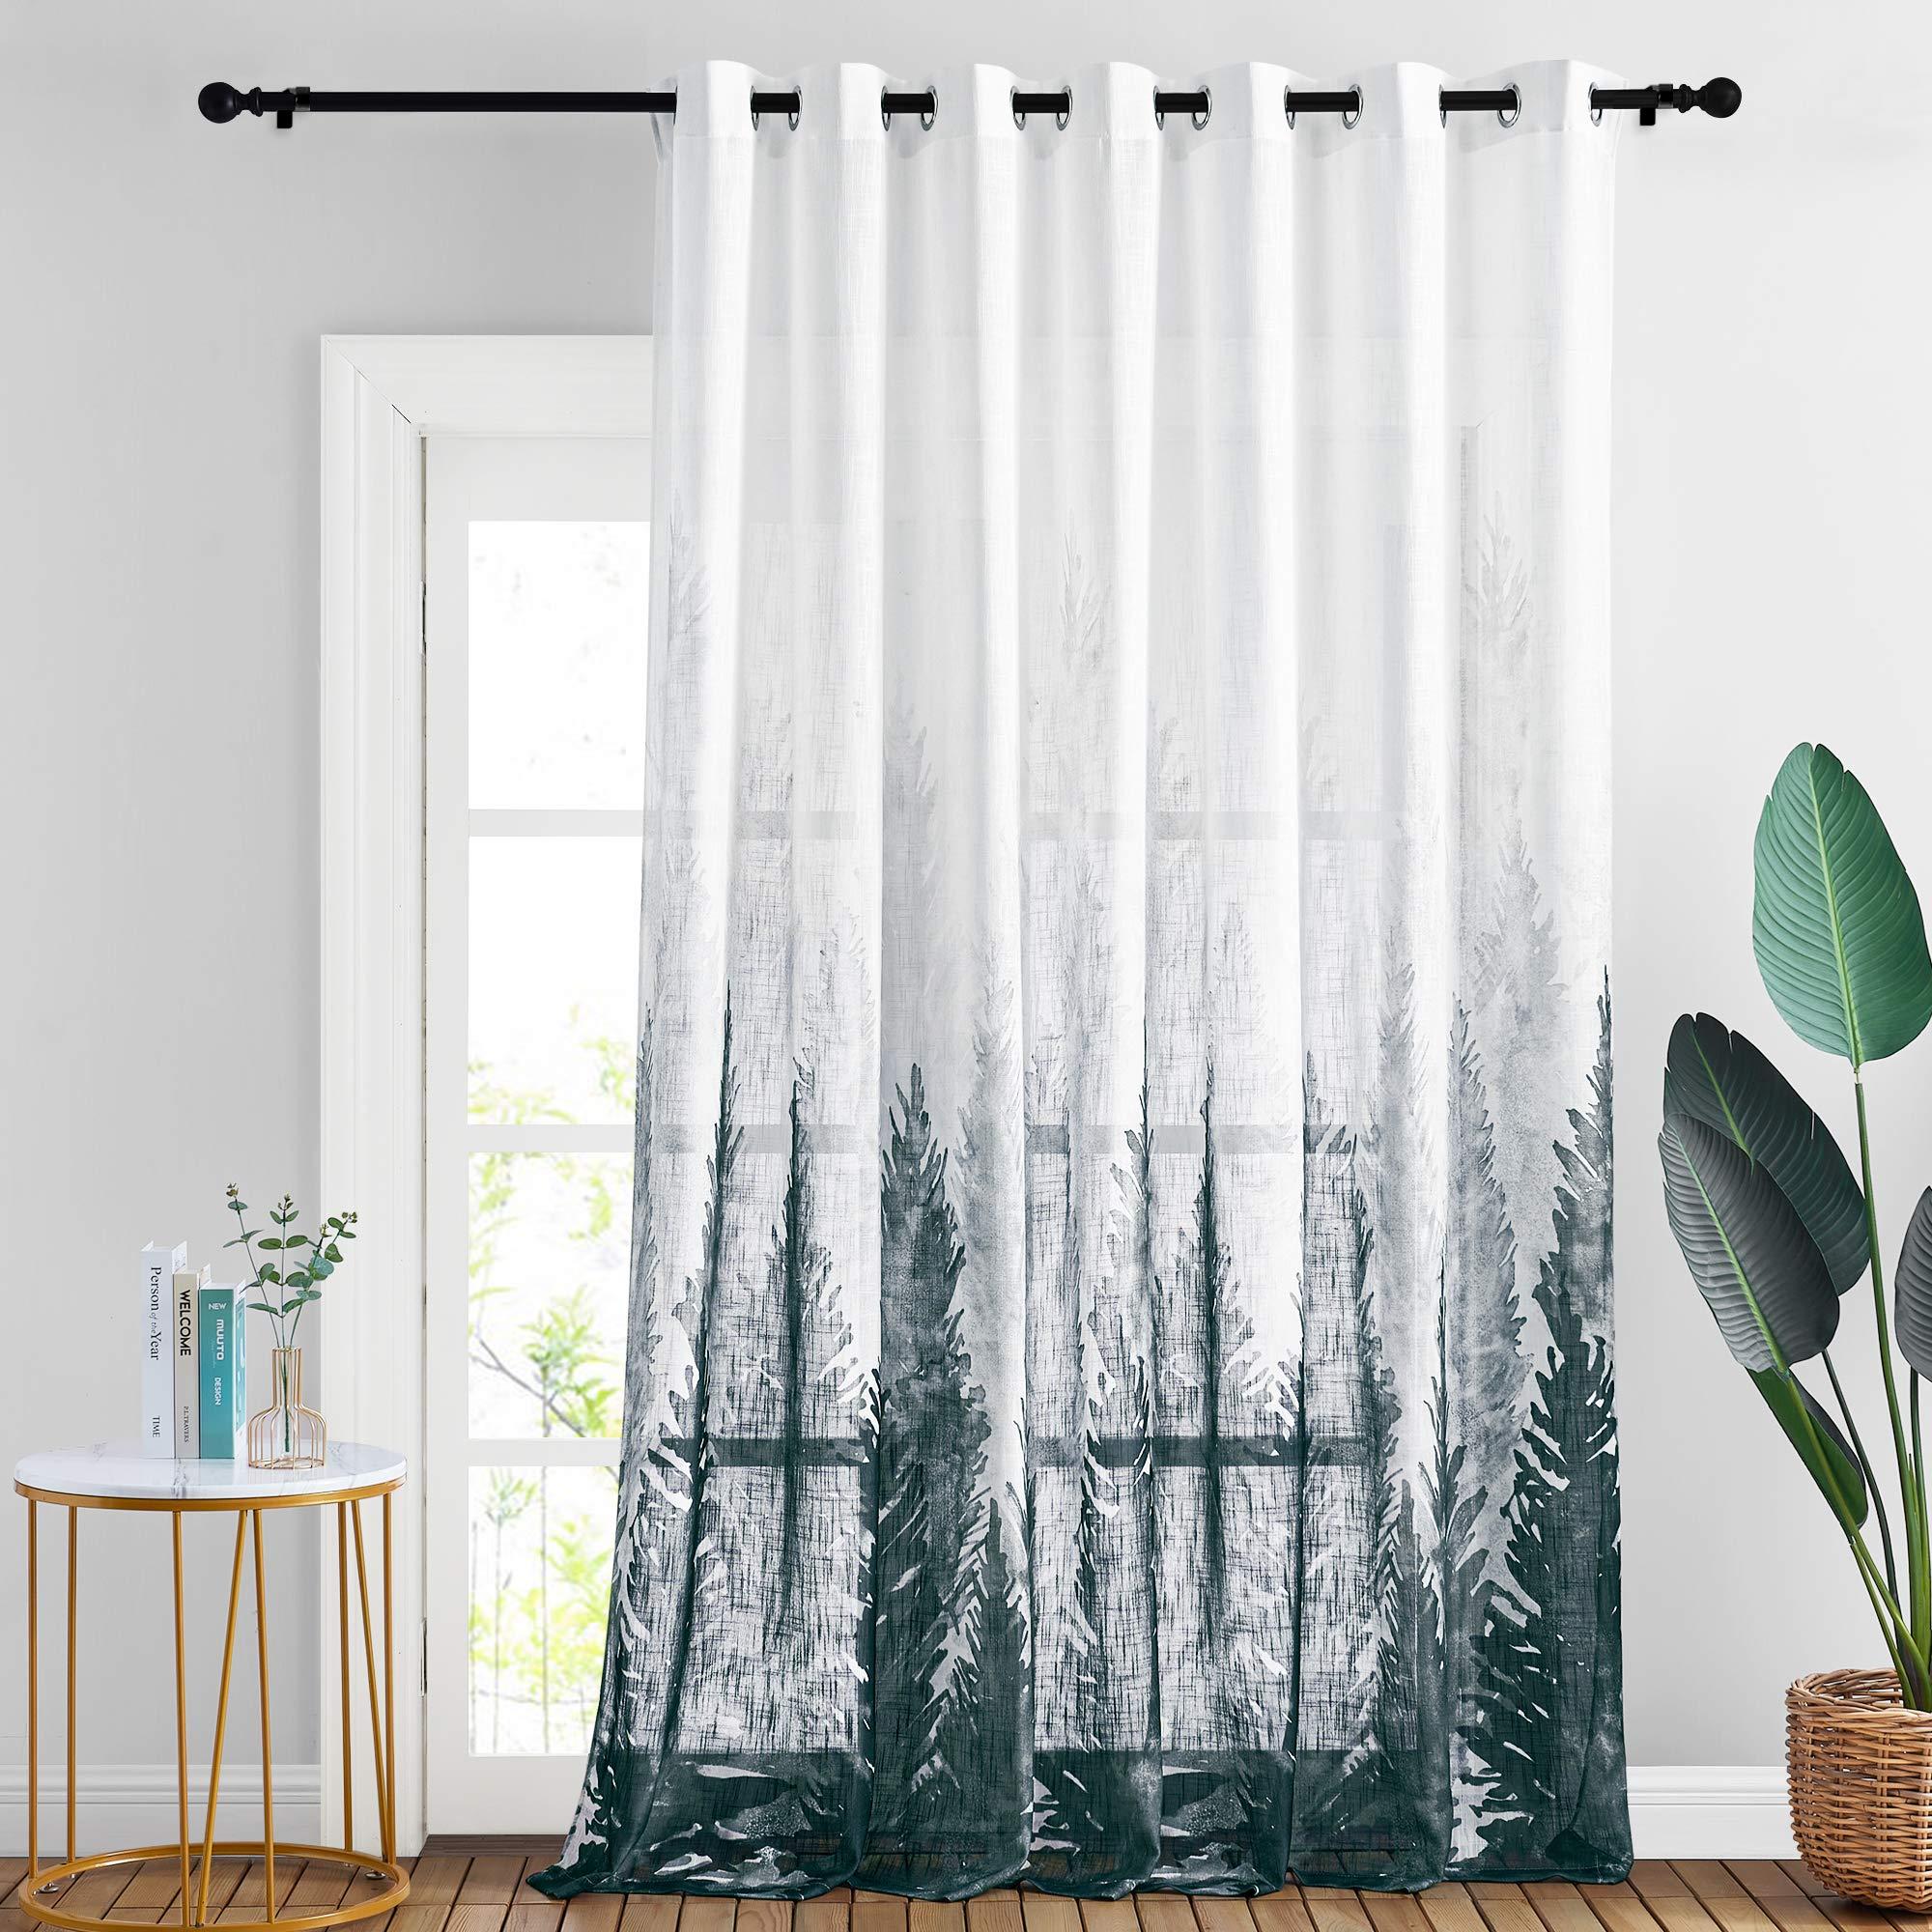 StangH Ombre Tree Printed Semi Sheer Patio Door Curtains Durable Linen Sheer